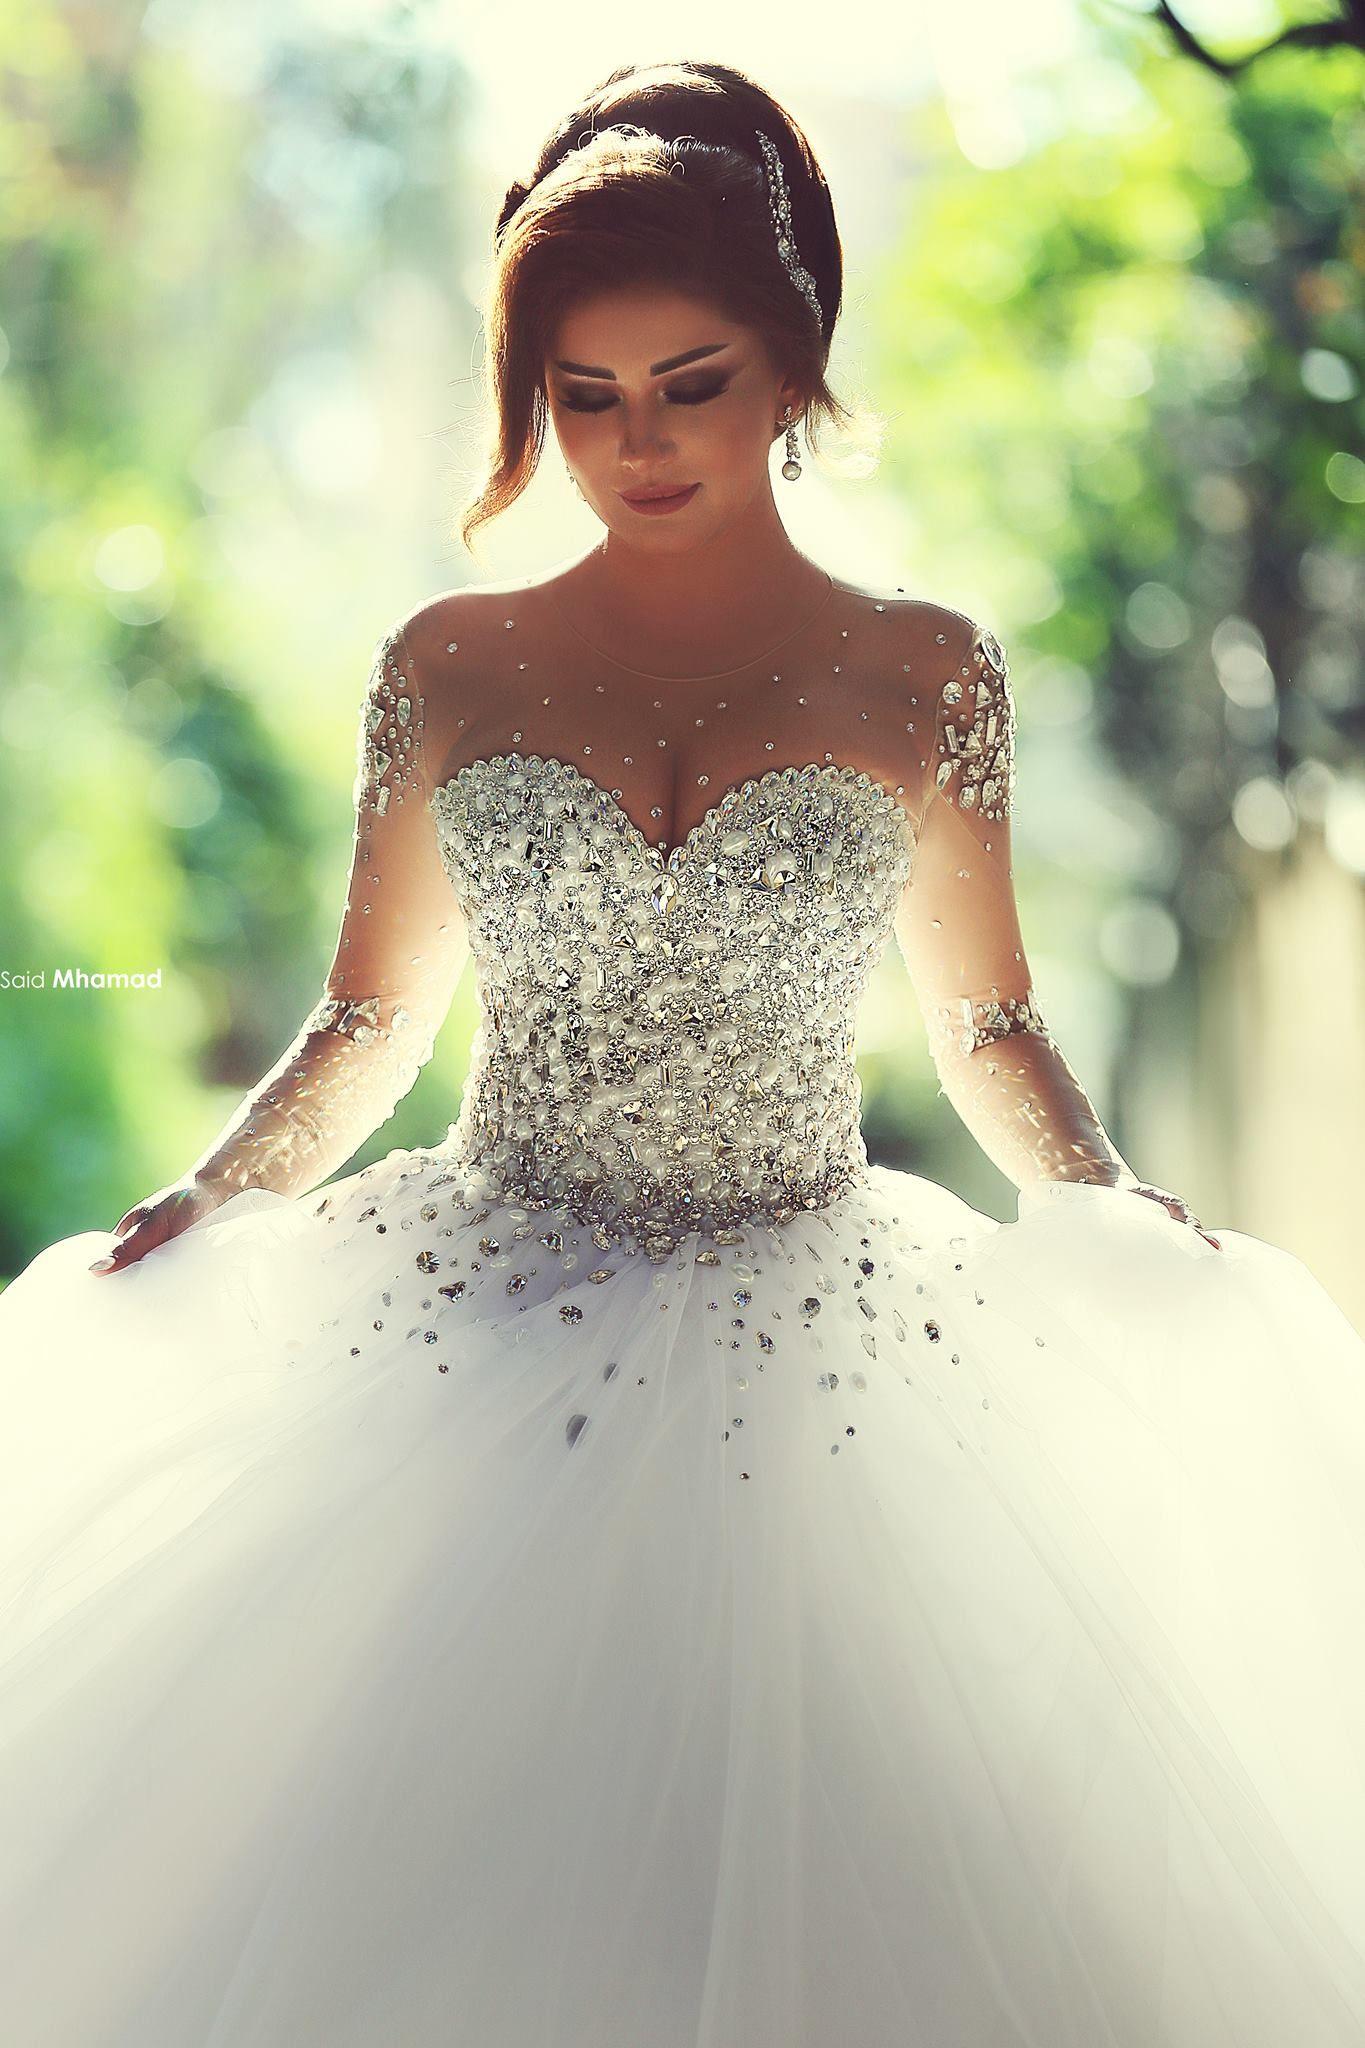 Vestiti Da Sposa Da Sogno.Pin By Shannon Conaty Helsel On Country Cowgirl Wedding Ball